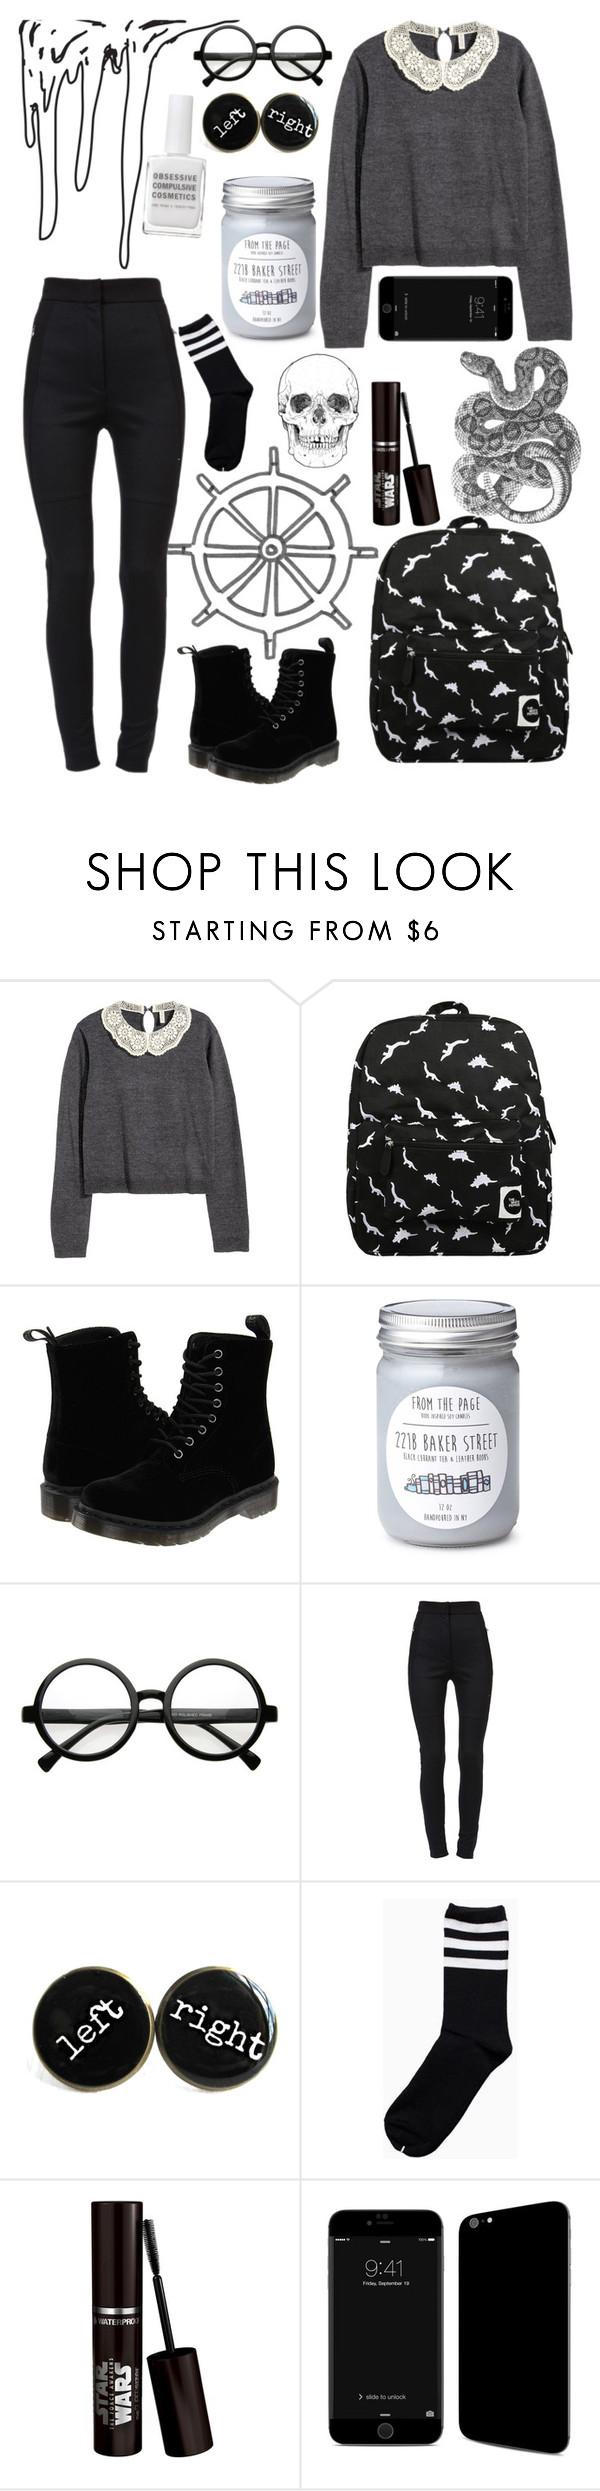 Touch Troye Sivan Clothes Design Women Fashion [ 2491 x 600 Pixel ]